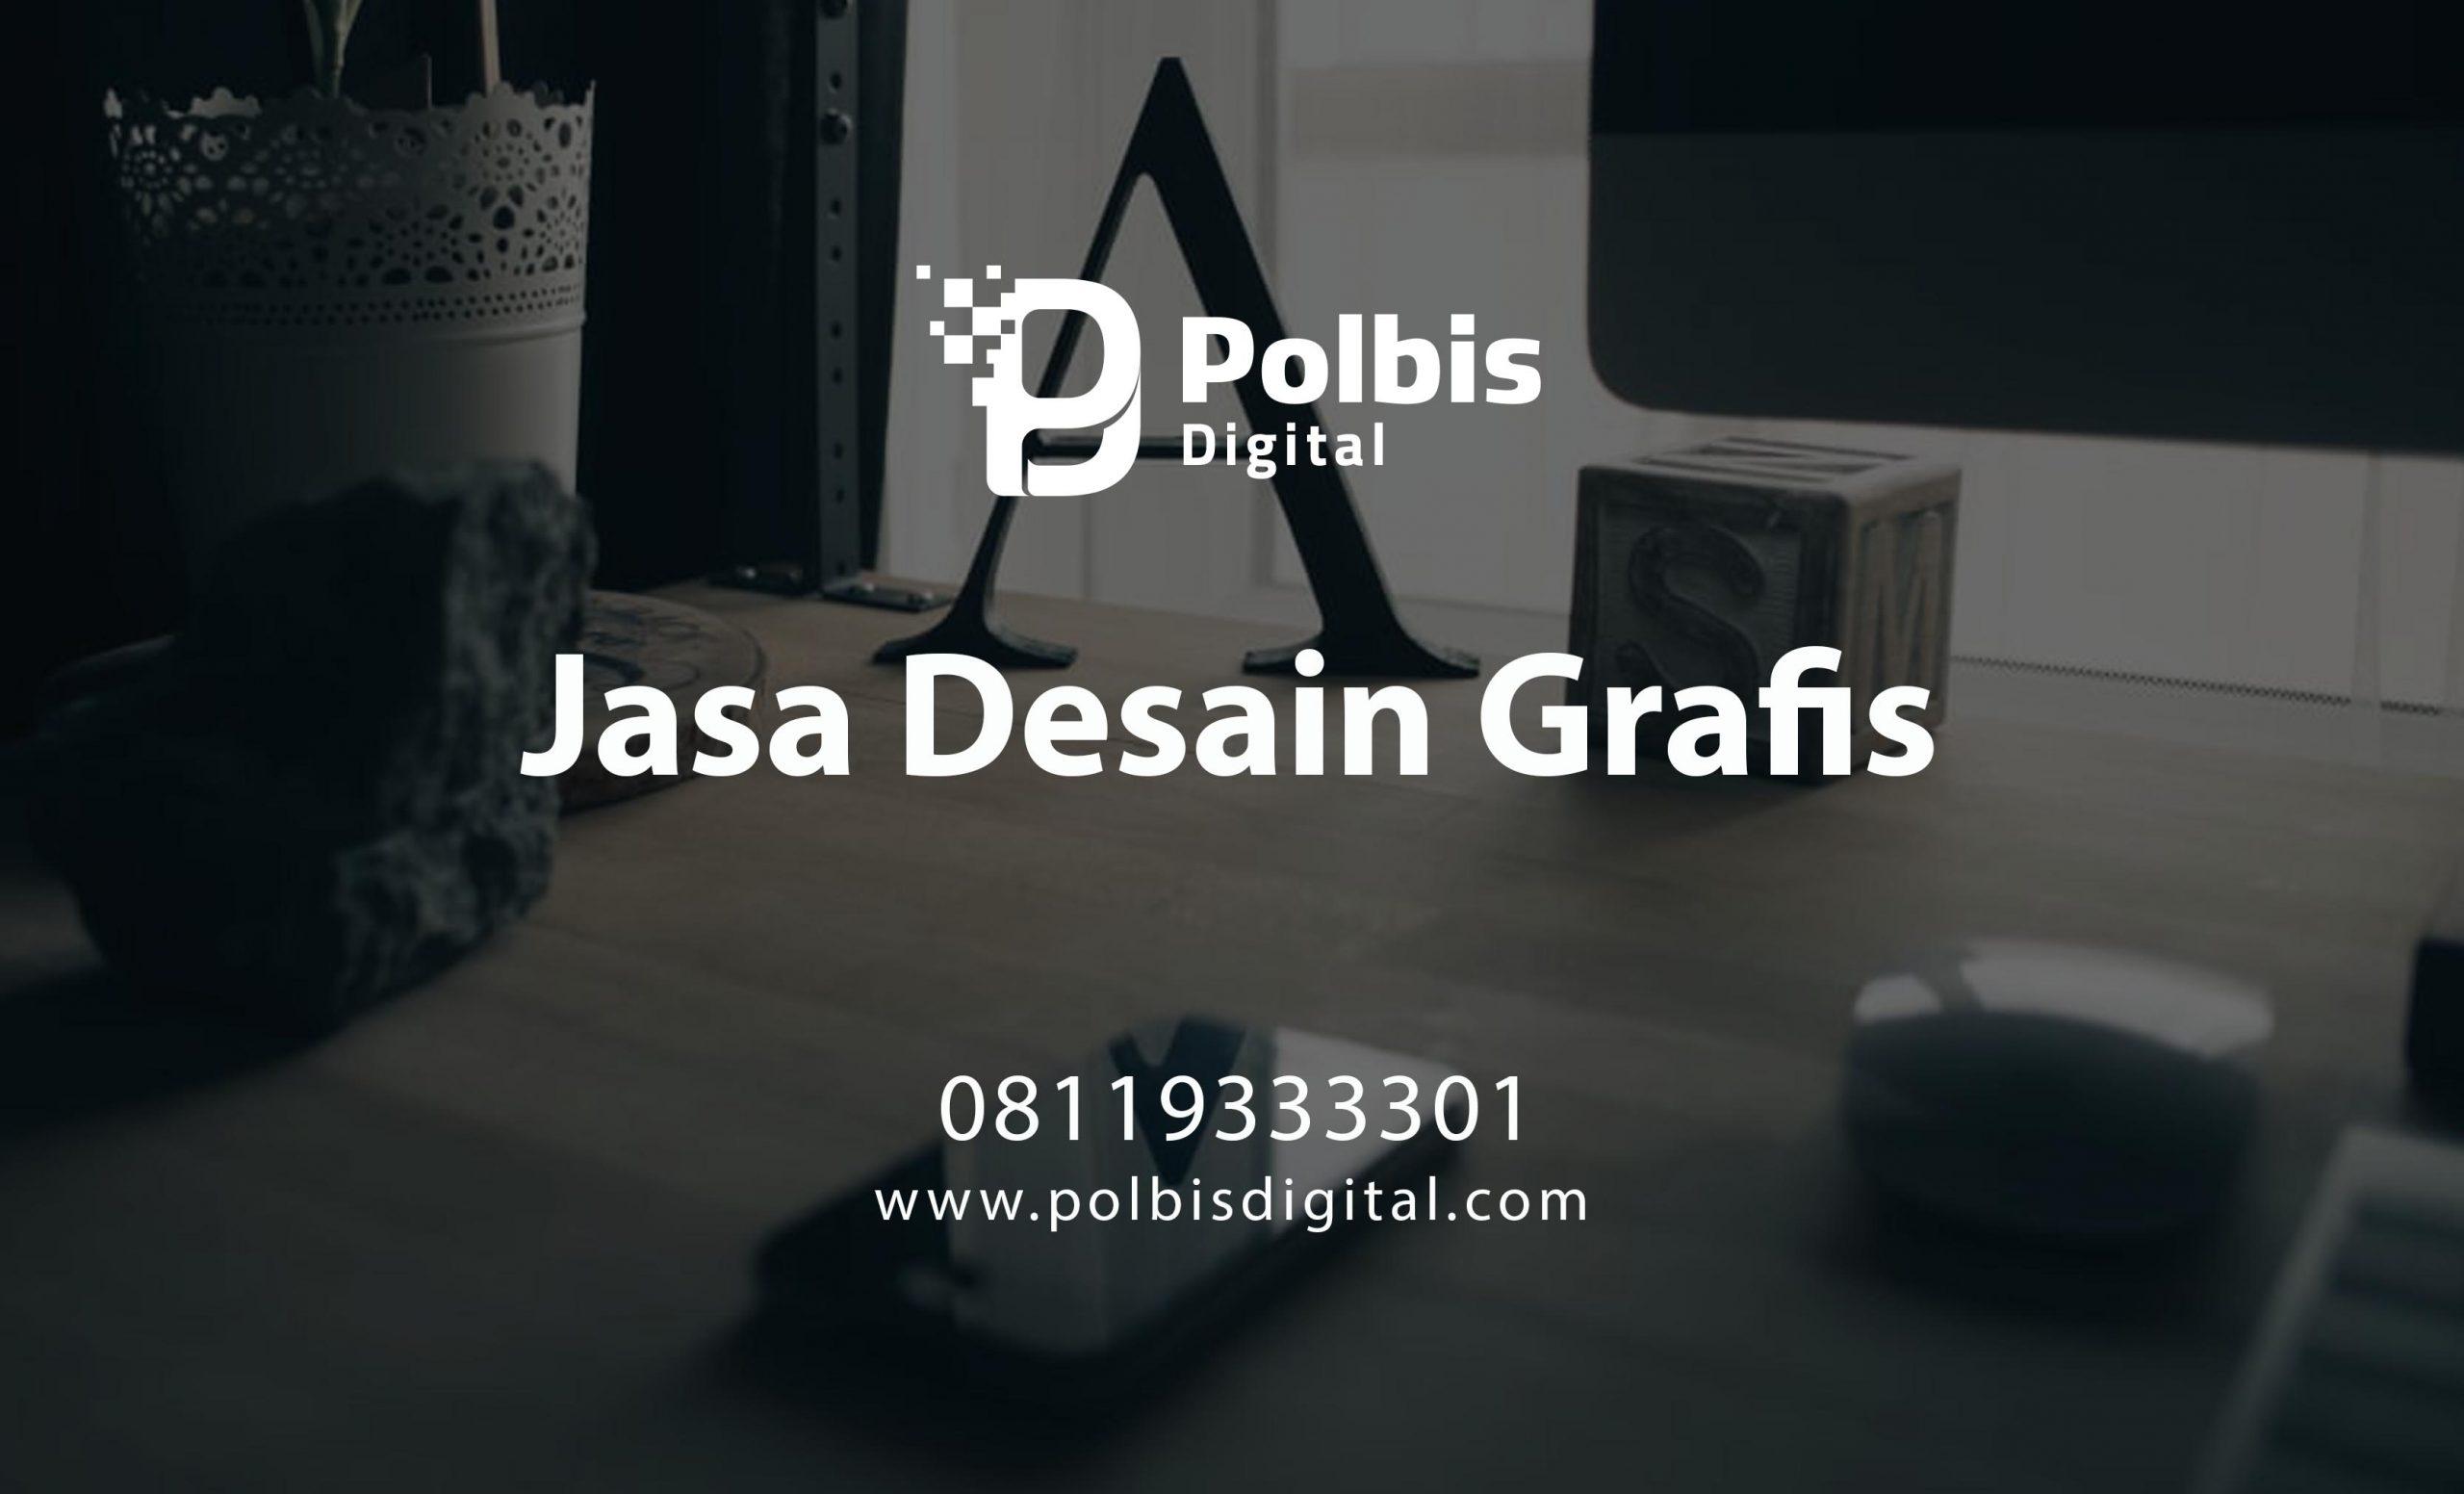 JASA DESAIN GRAFIS LUBUK PAKAM